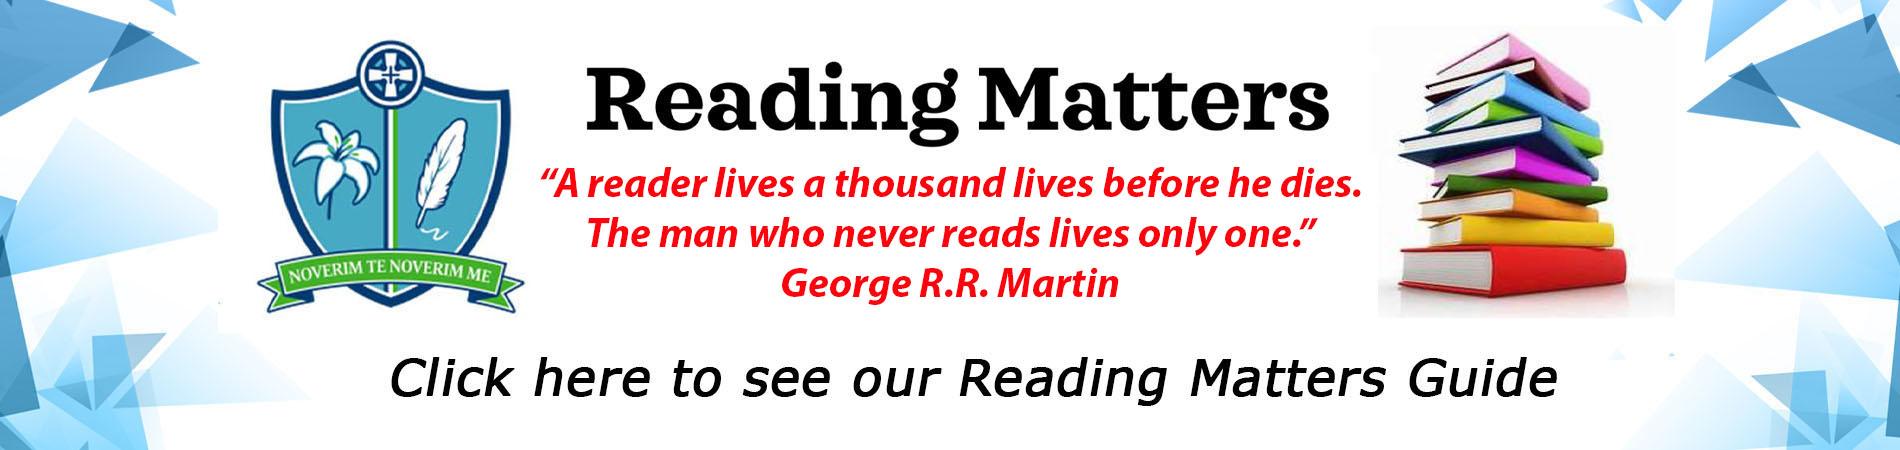 readingmatters4